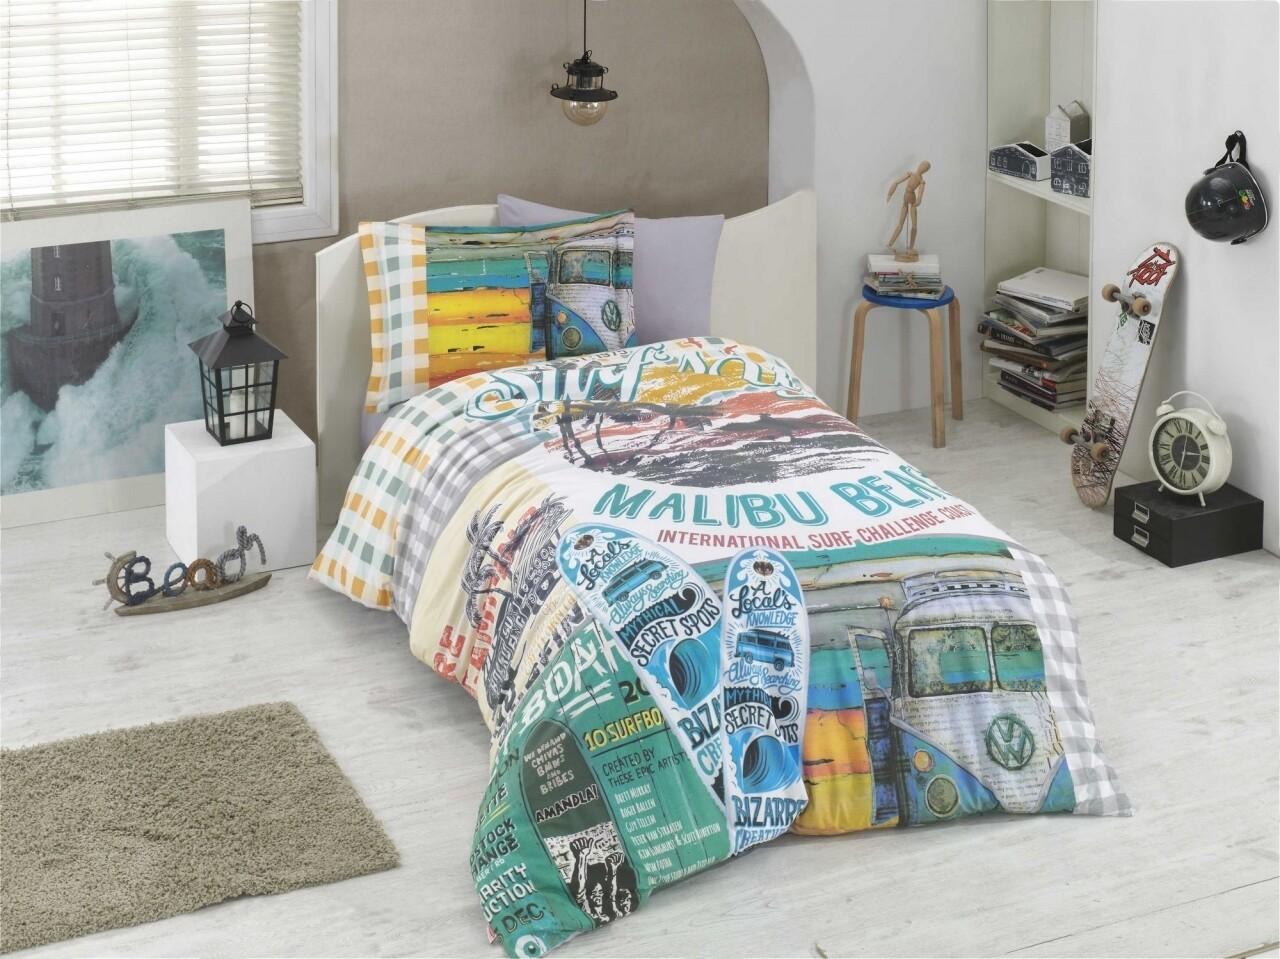 Lenjerie de pat pentru o persoana, 3 piese, 100% bumbac poplin, Hobby, Malibu Beach Multy, multicolora